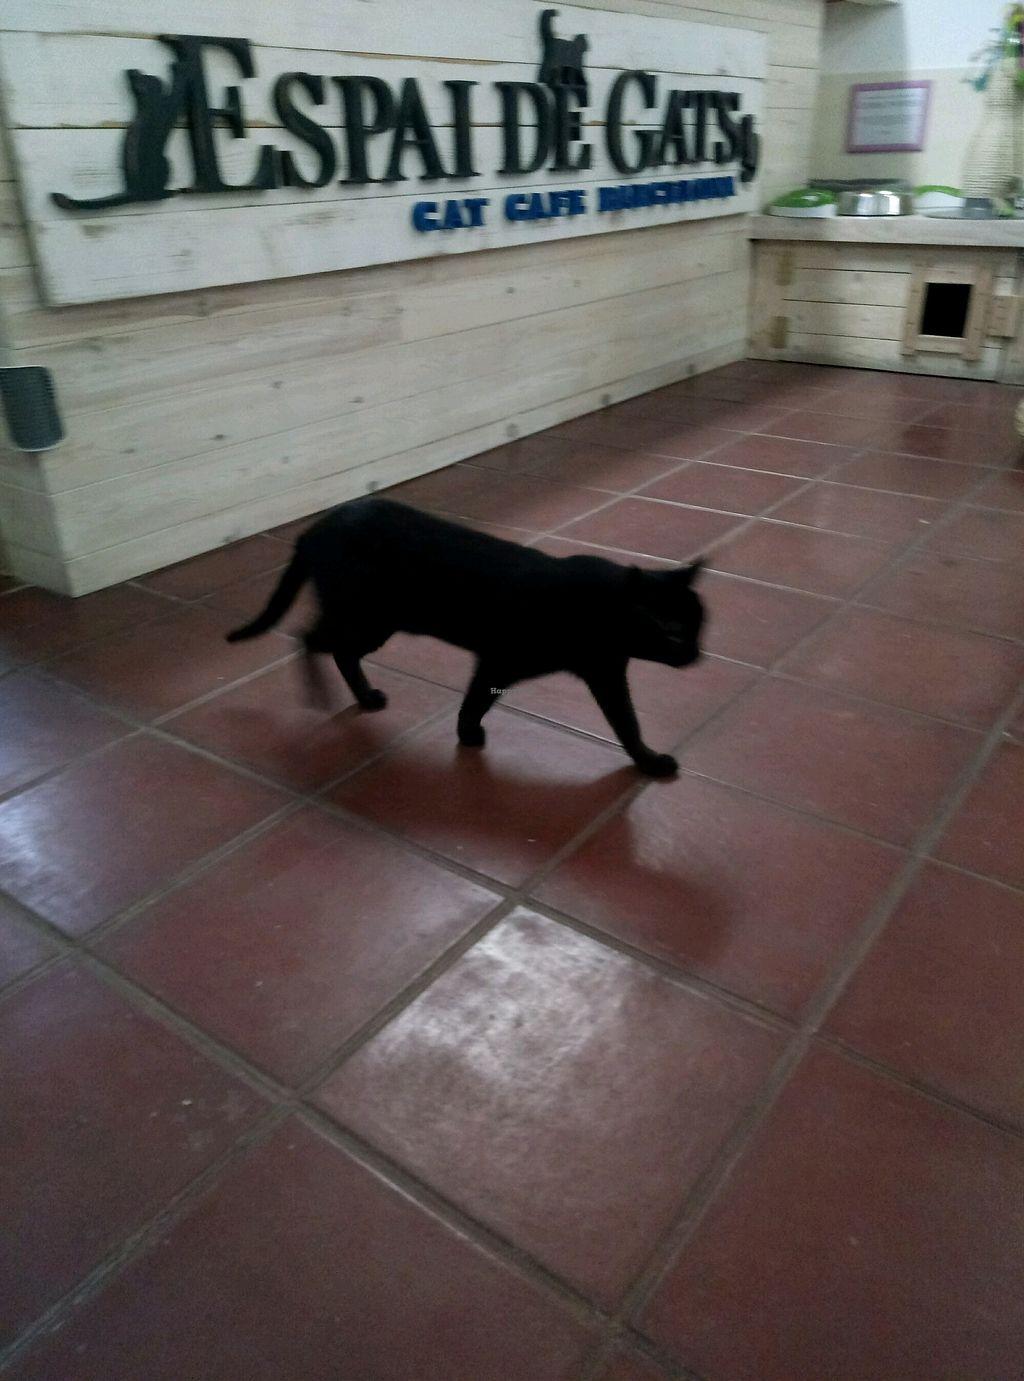 "Photo of Espai de Gats  by <a href=""/members/profile/InbalTenembaum"">InbalTenembaum</a> <br/>cat  <br/> February 8, 2018  - <a href='/contact/abuse/image/86666/356360'>Report</a>"